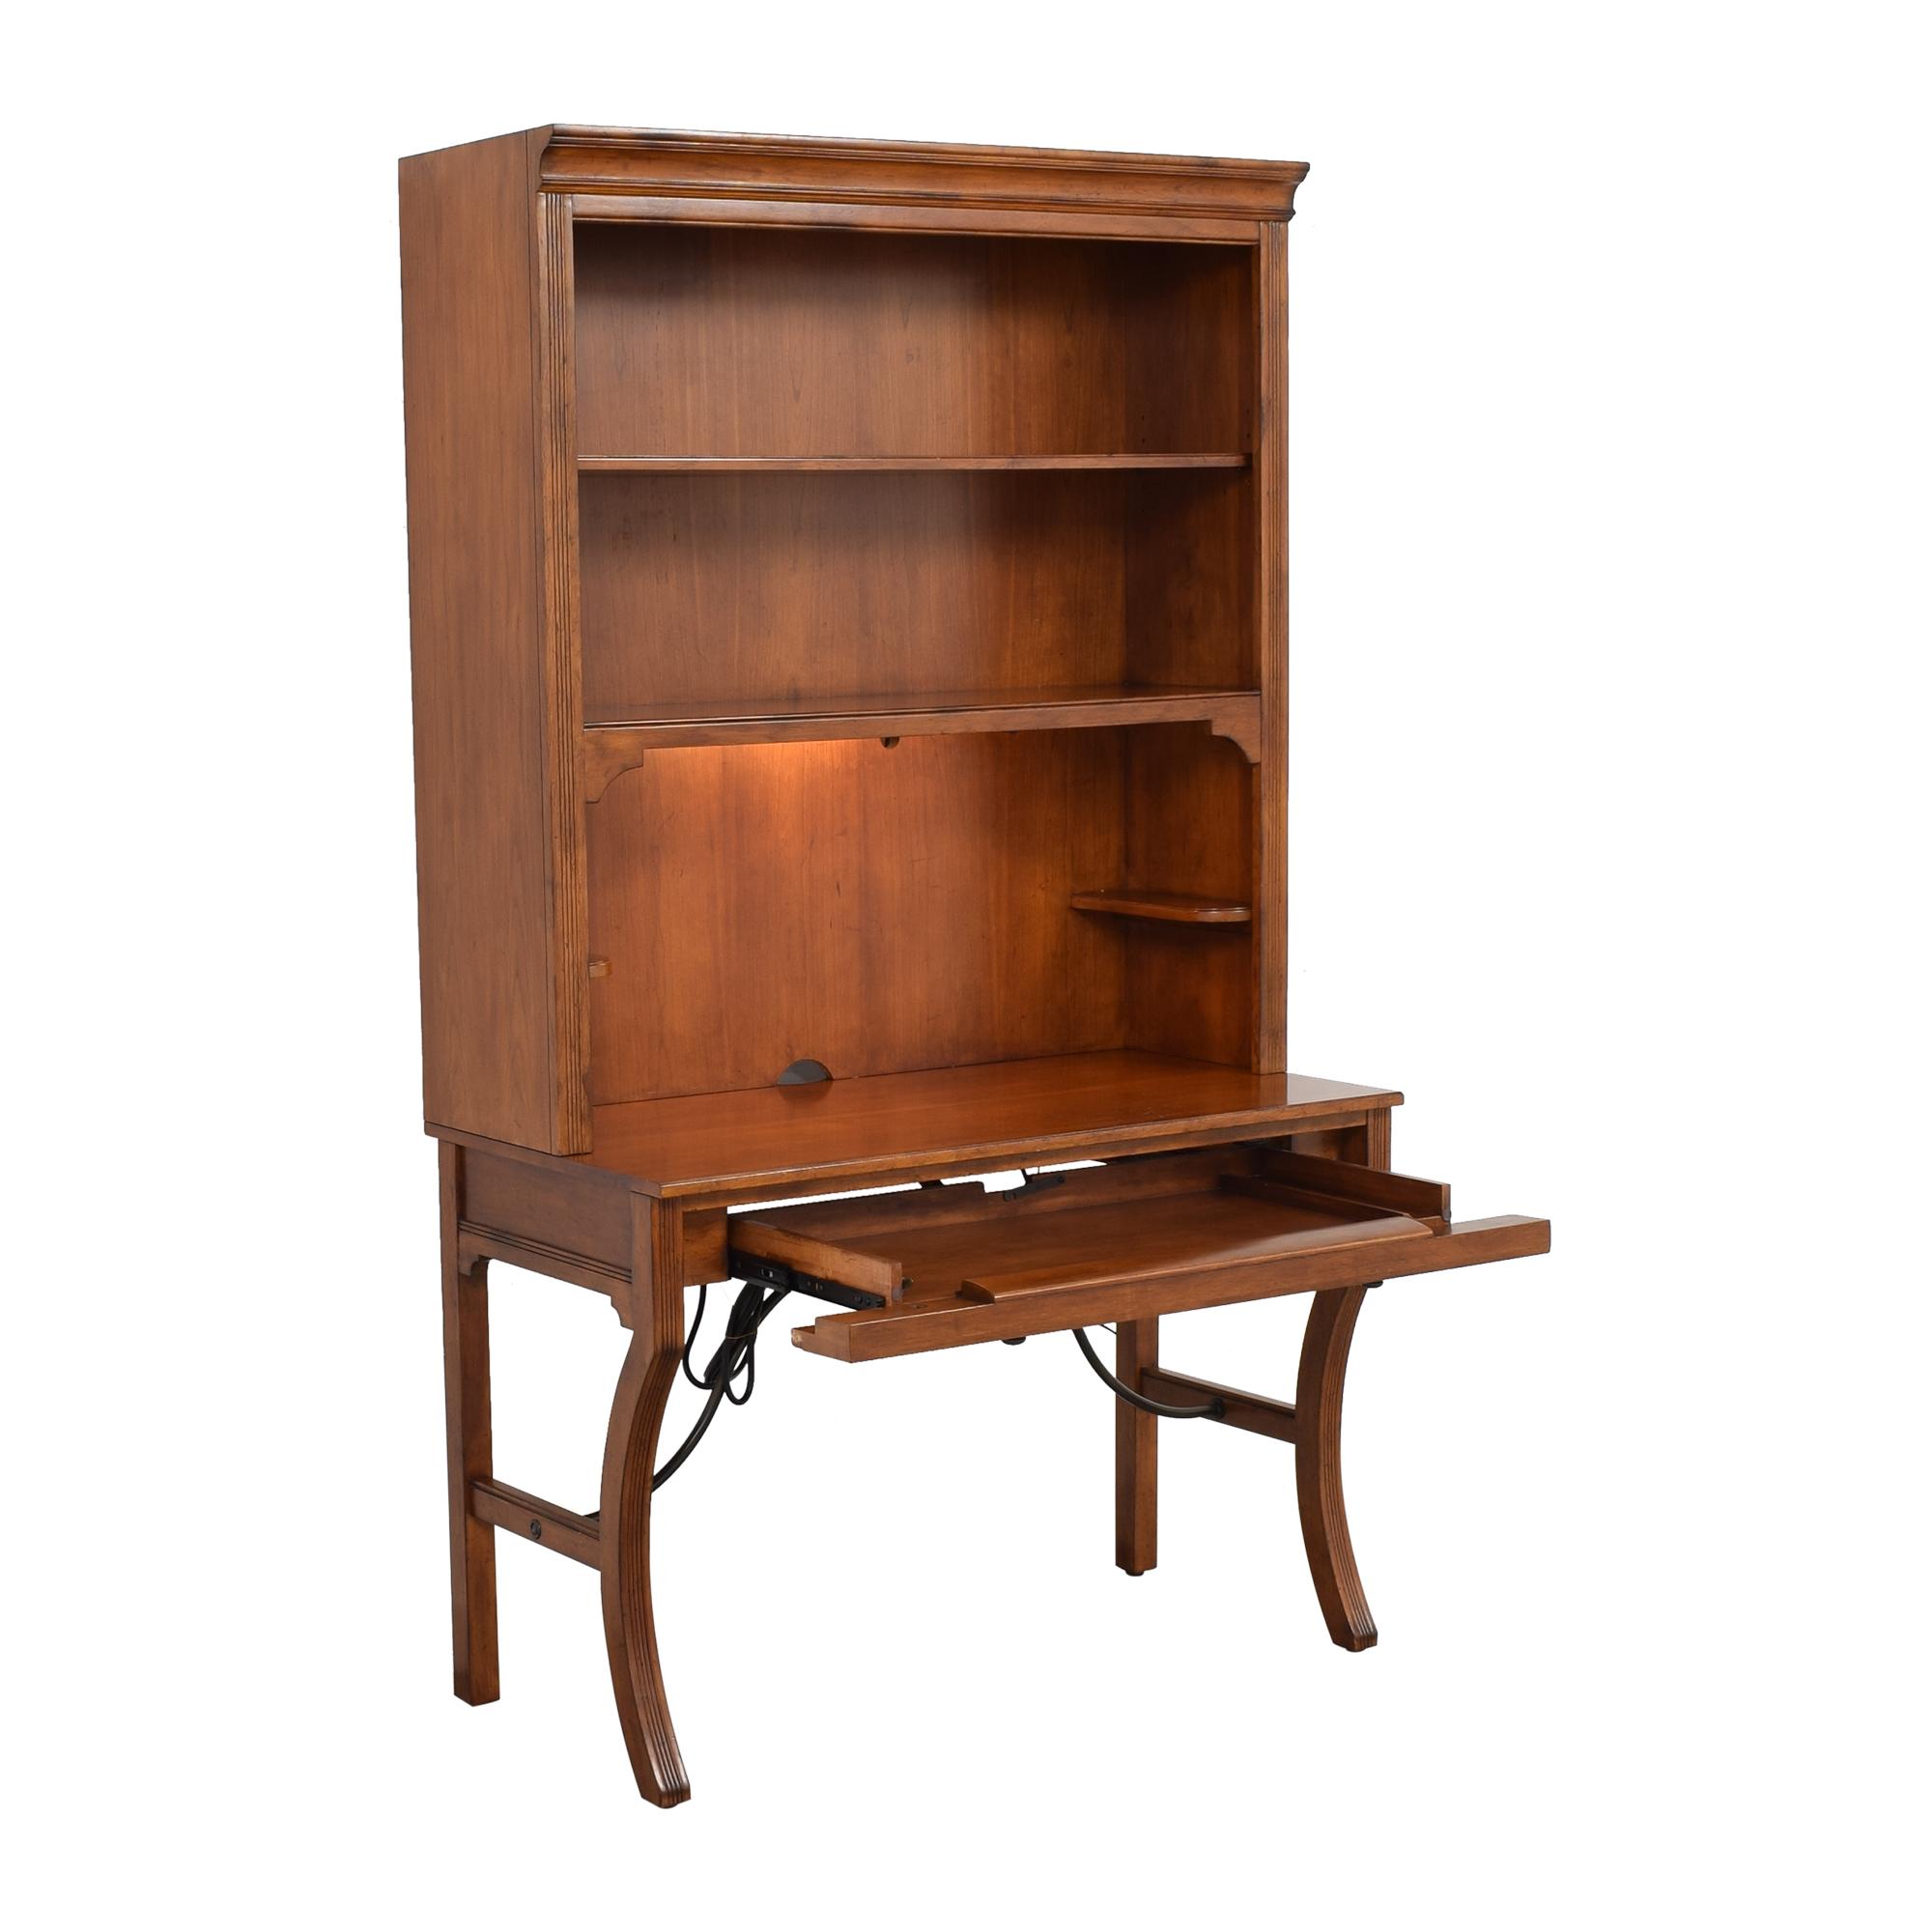 Sligh Furniture Sligh Furniture Single Drawer Desk with Hutch  coupon